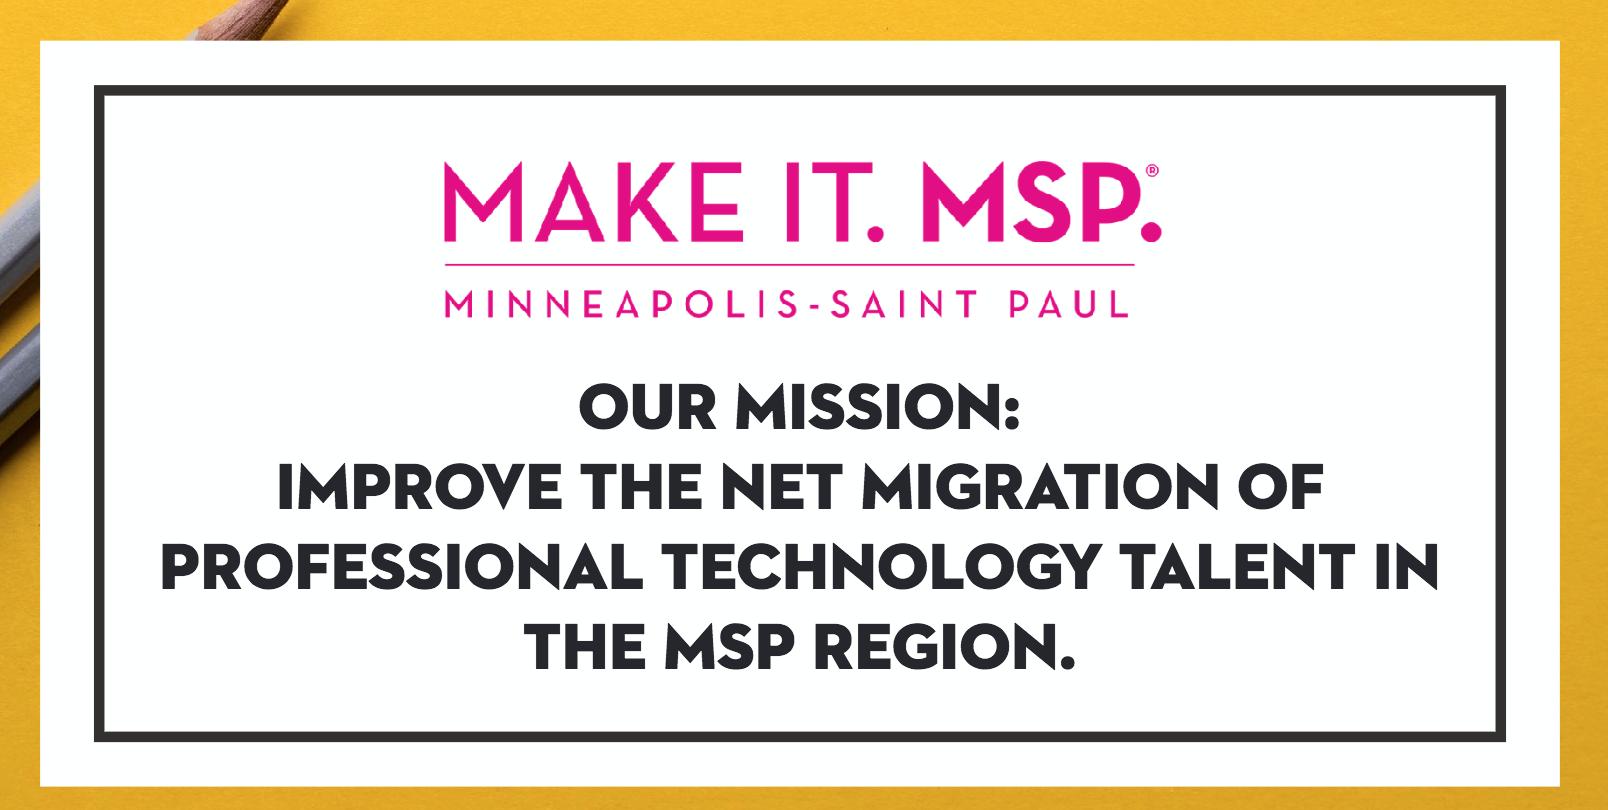 Make it MSP mission.png